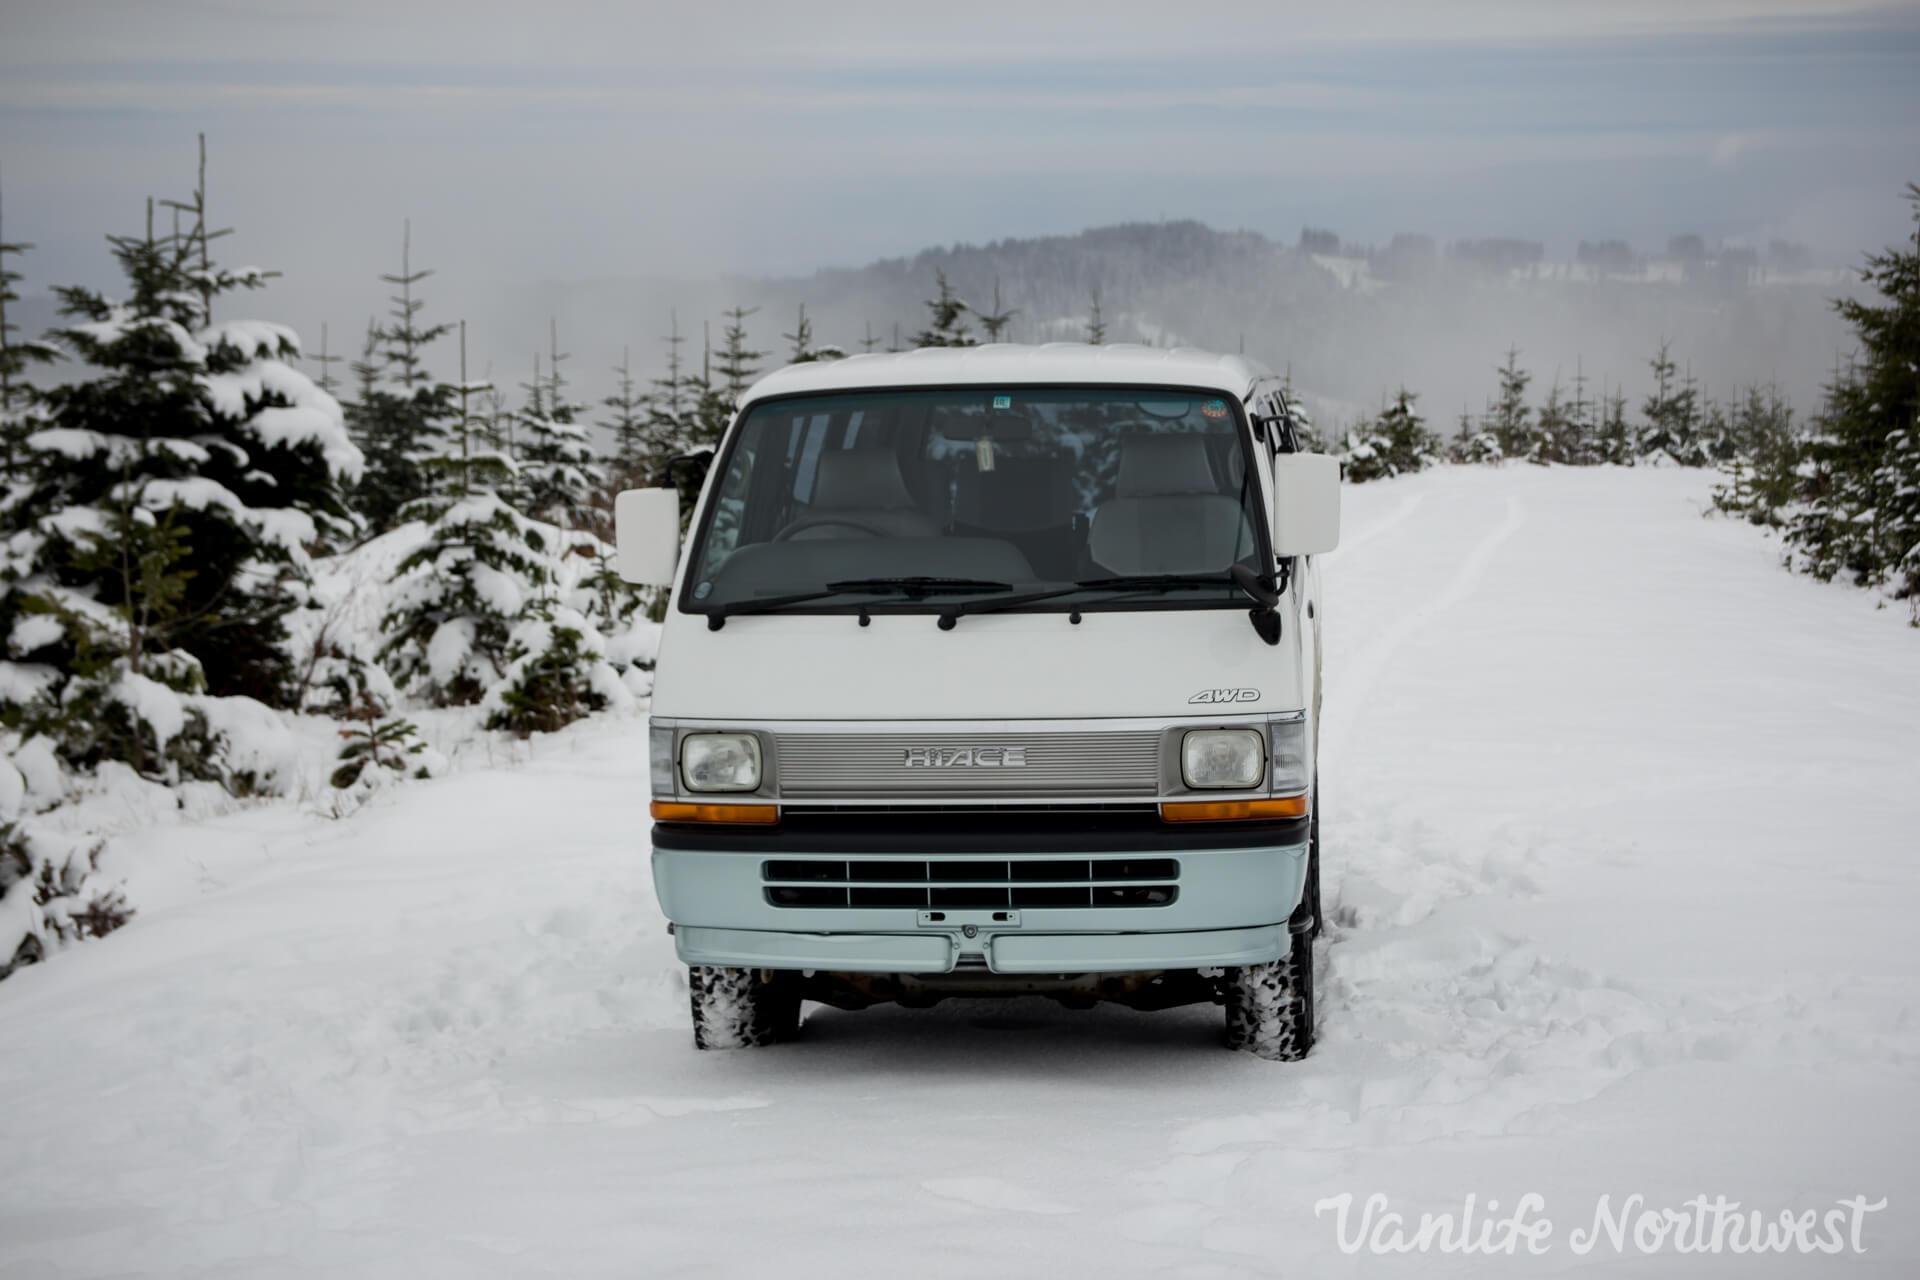 ToyotaHiaceLH119-JoeH-38.jpg